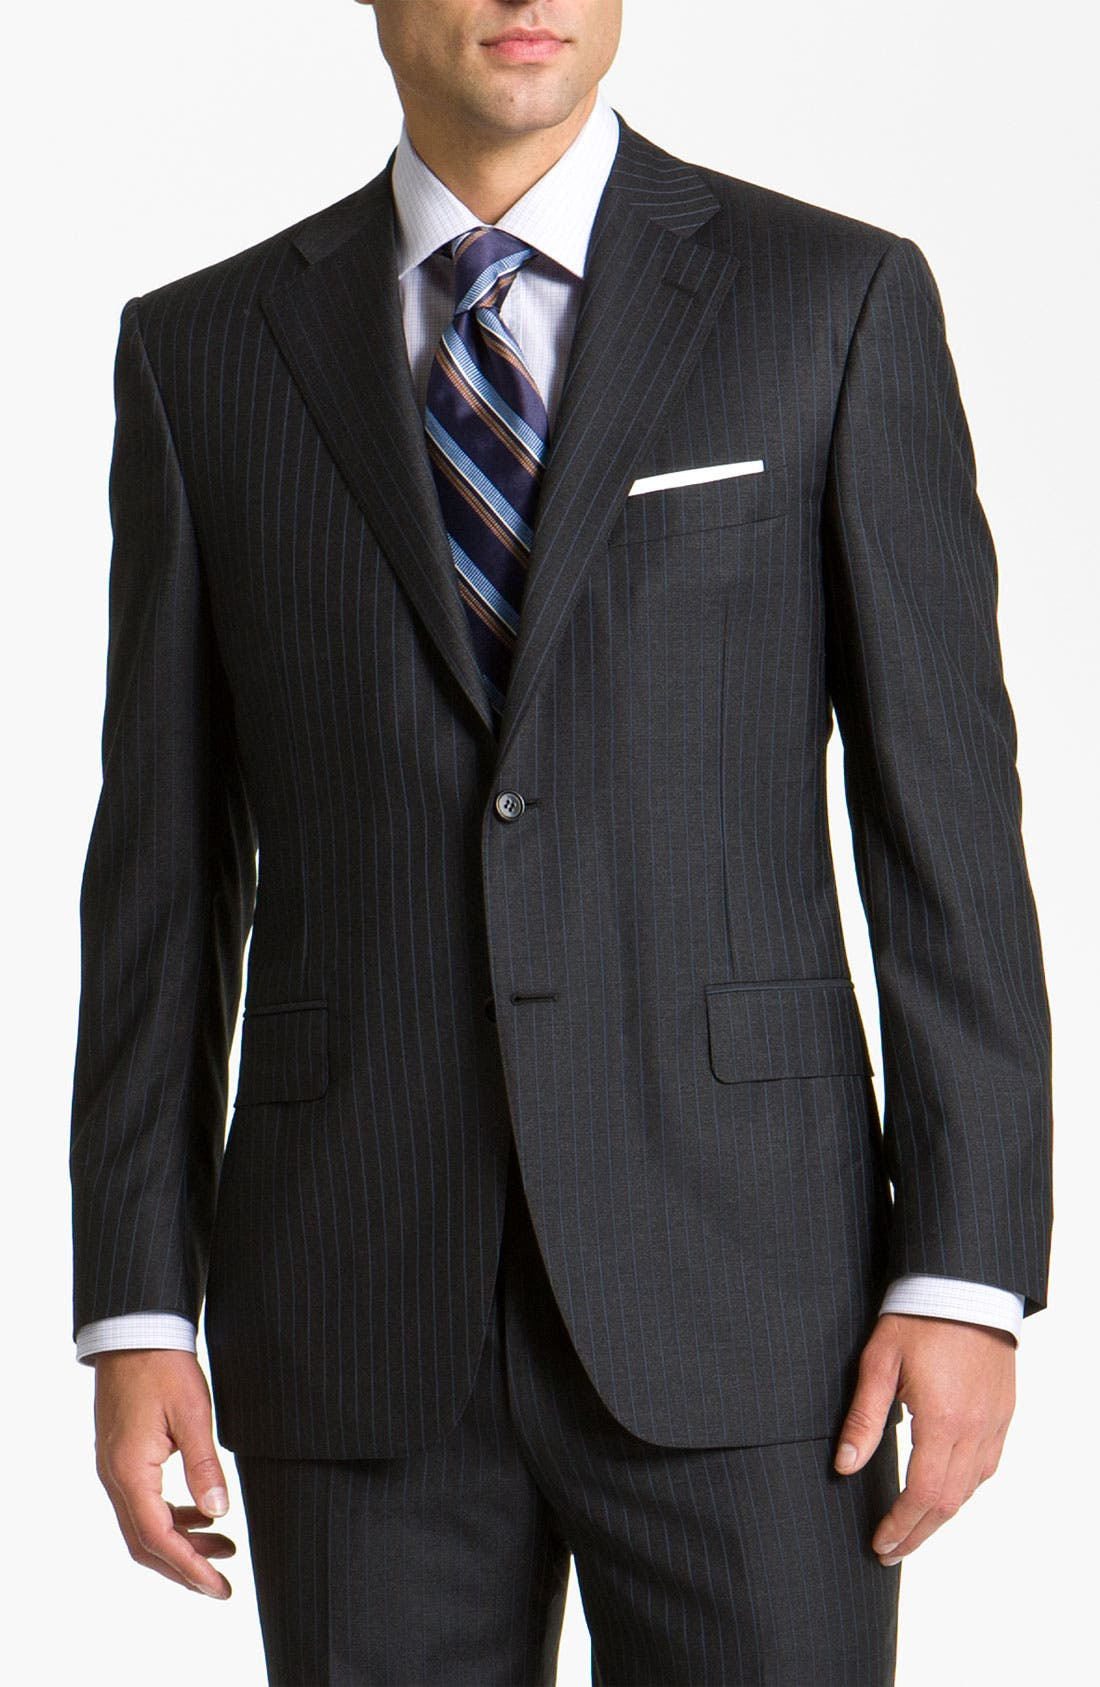 Main Image - Canali Stripe Suit